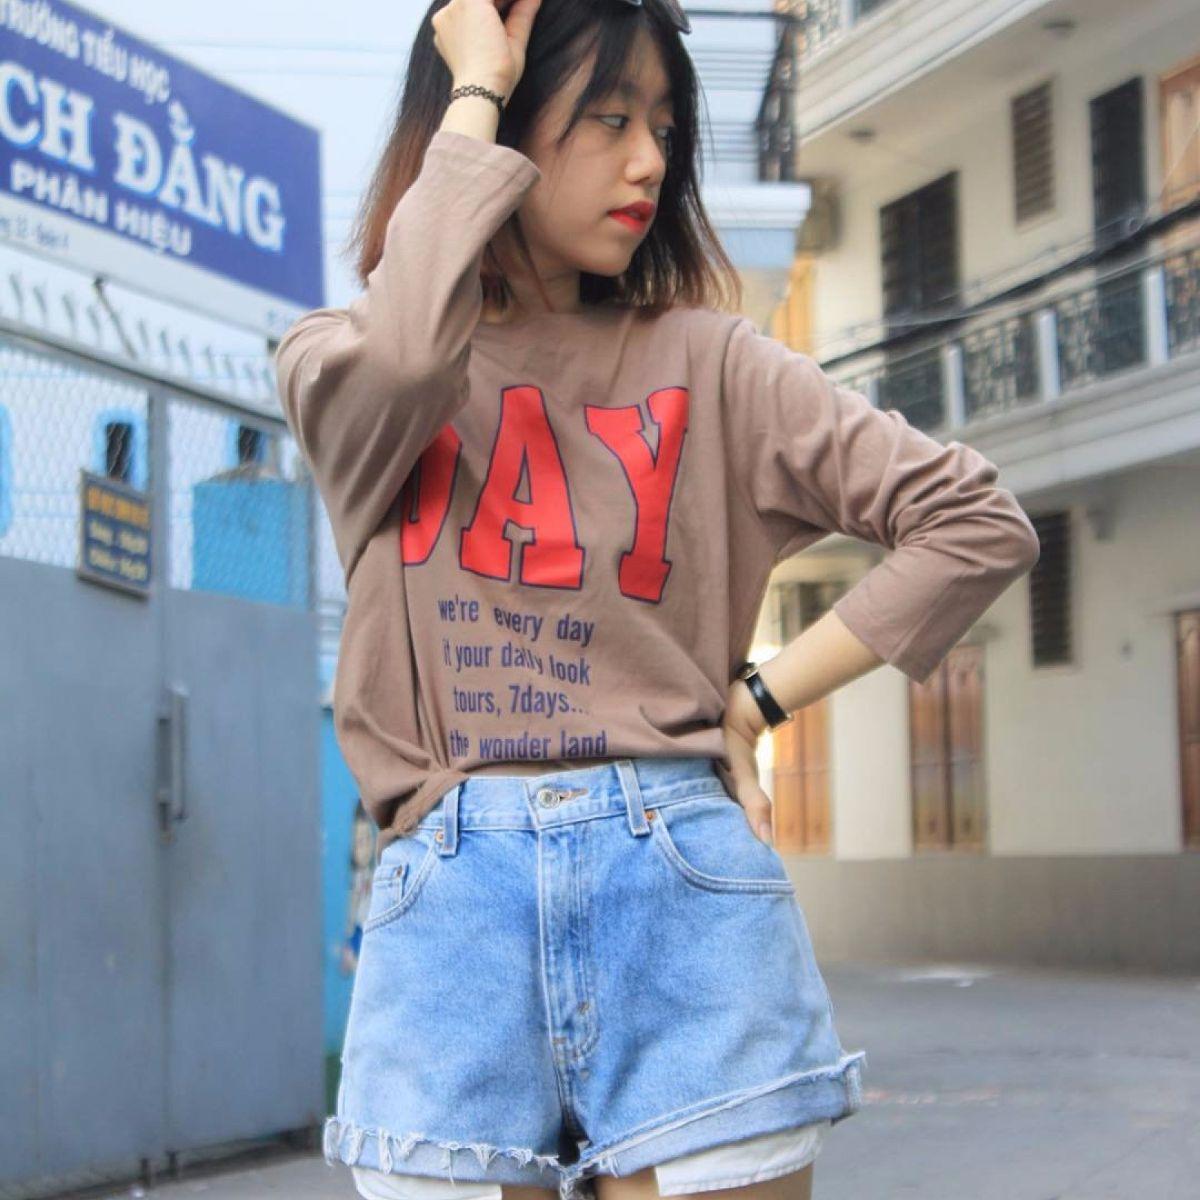 Shop thoi trang nu noi tieng o Nguyen Dinh Chieu The twiins